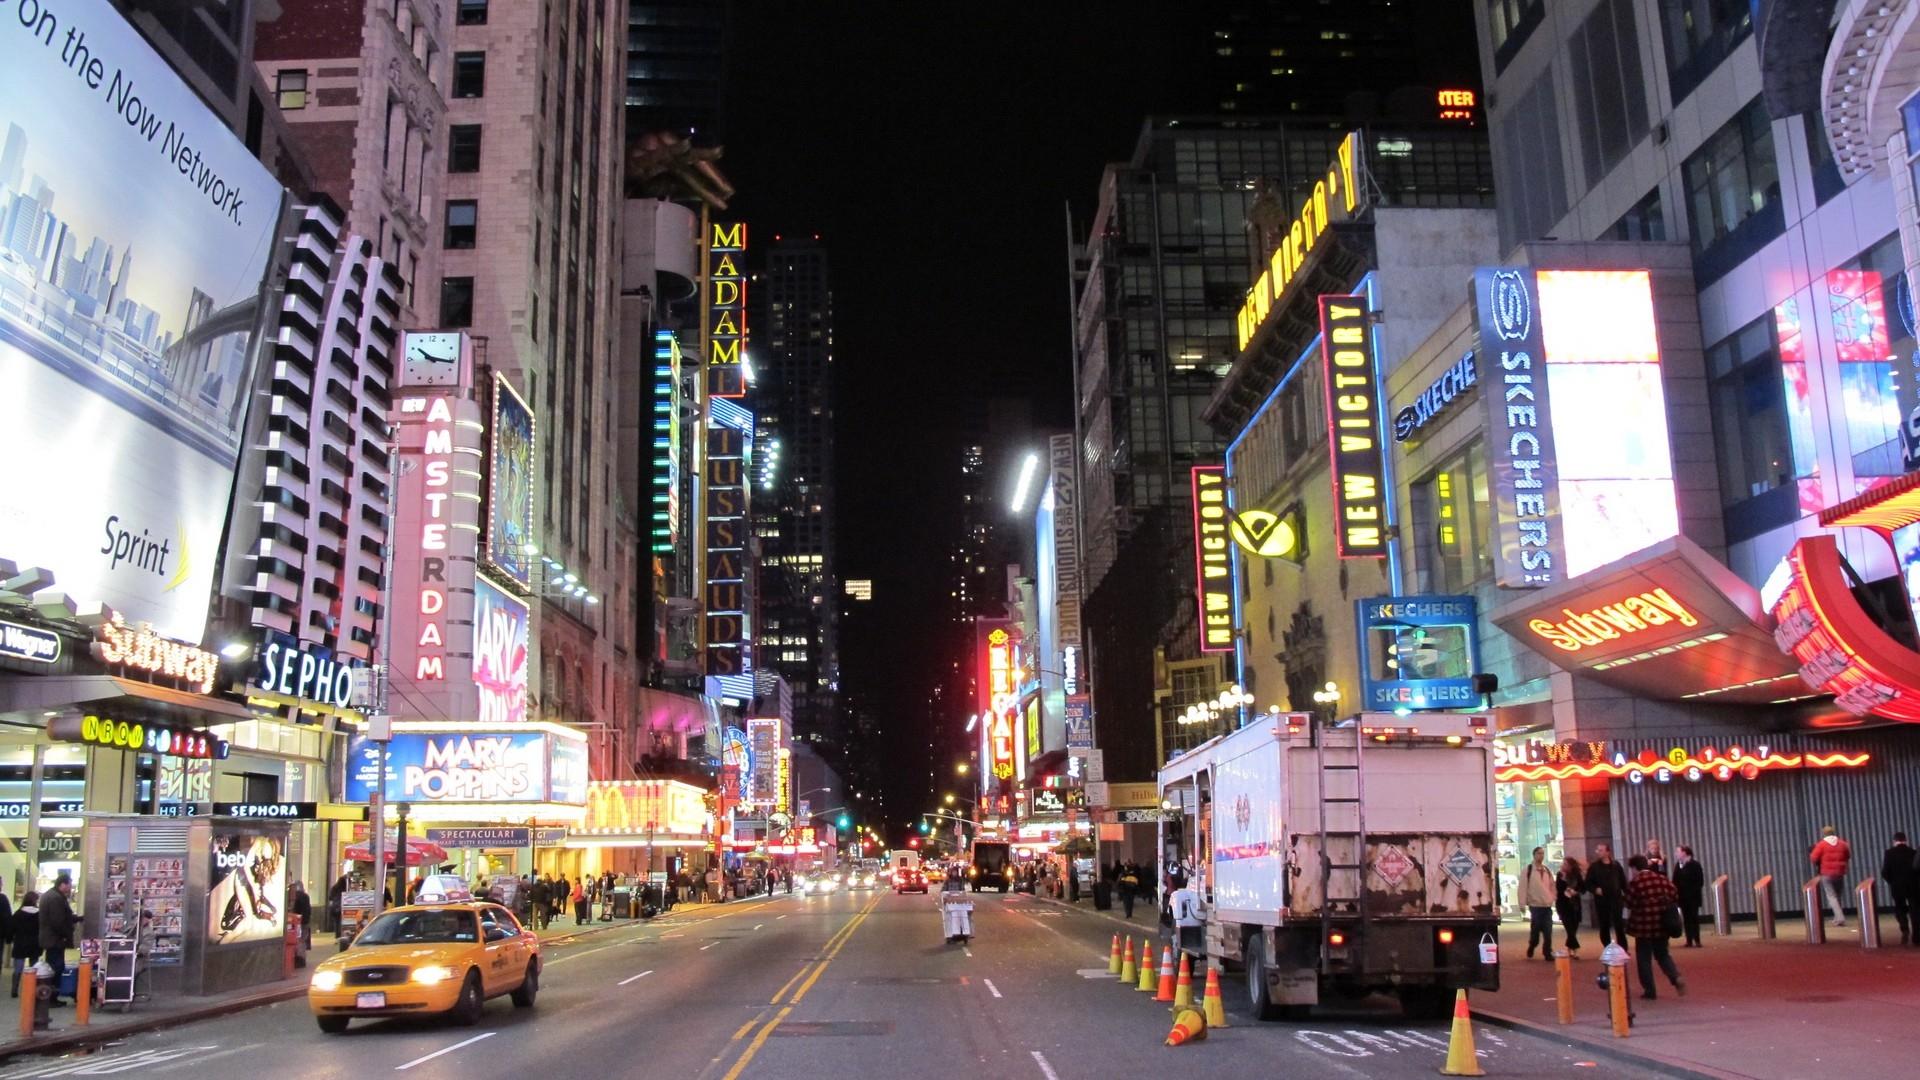 USA New York Skyscrapers Lights City Road